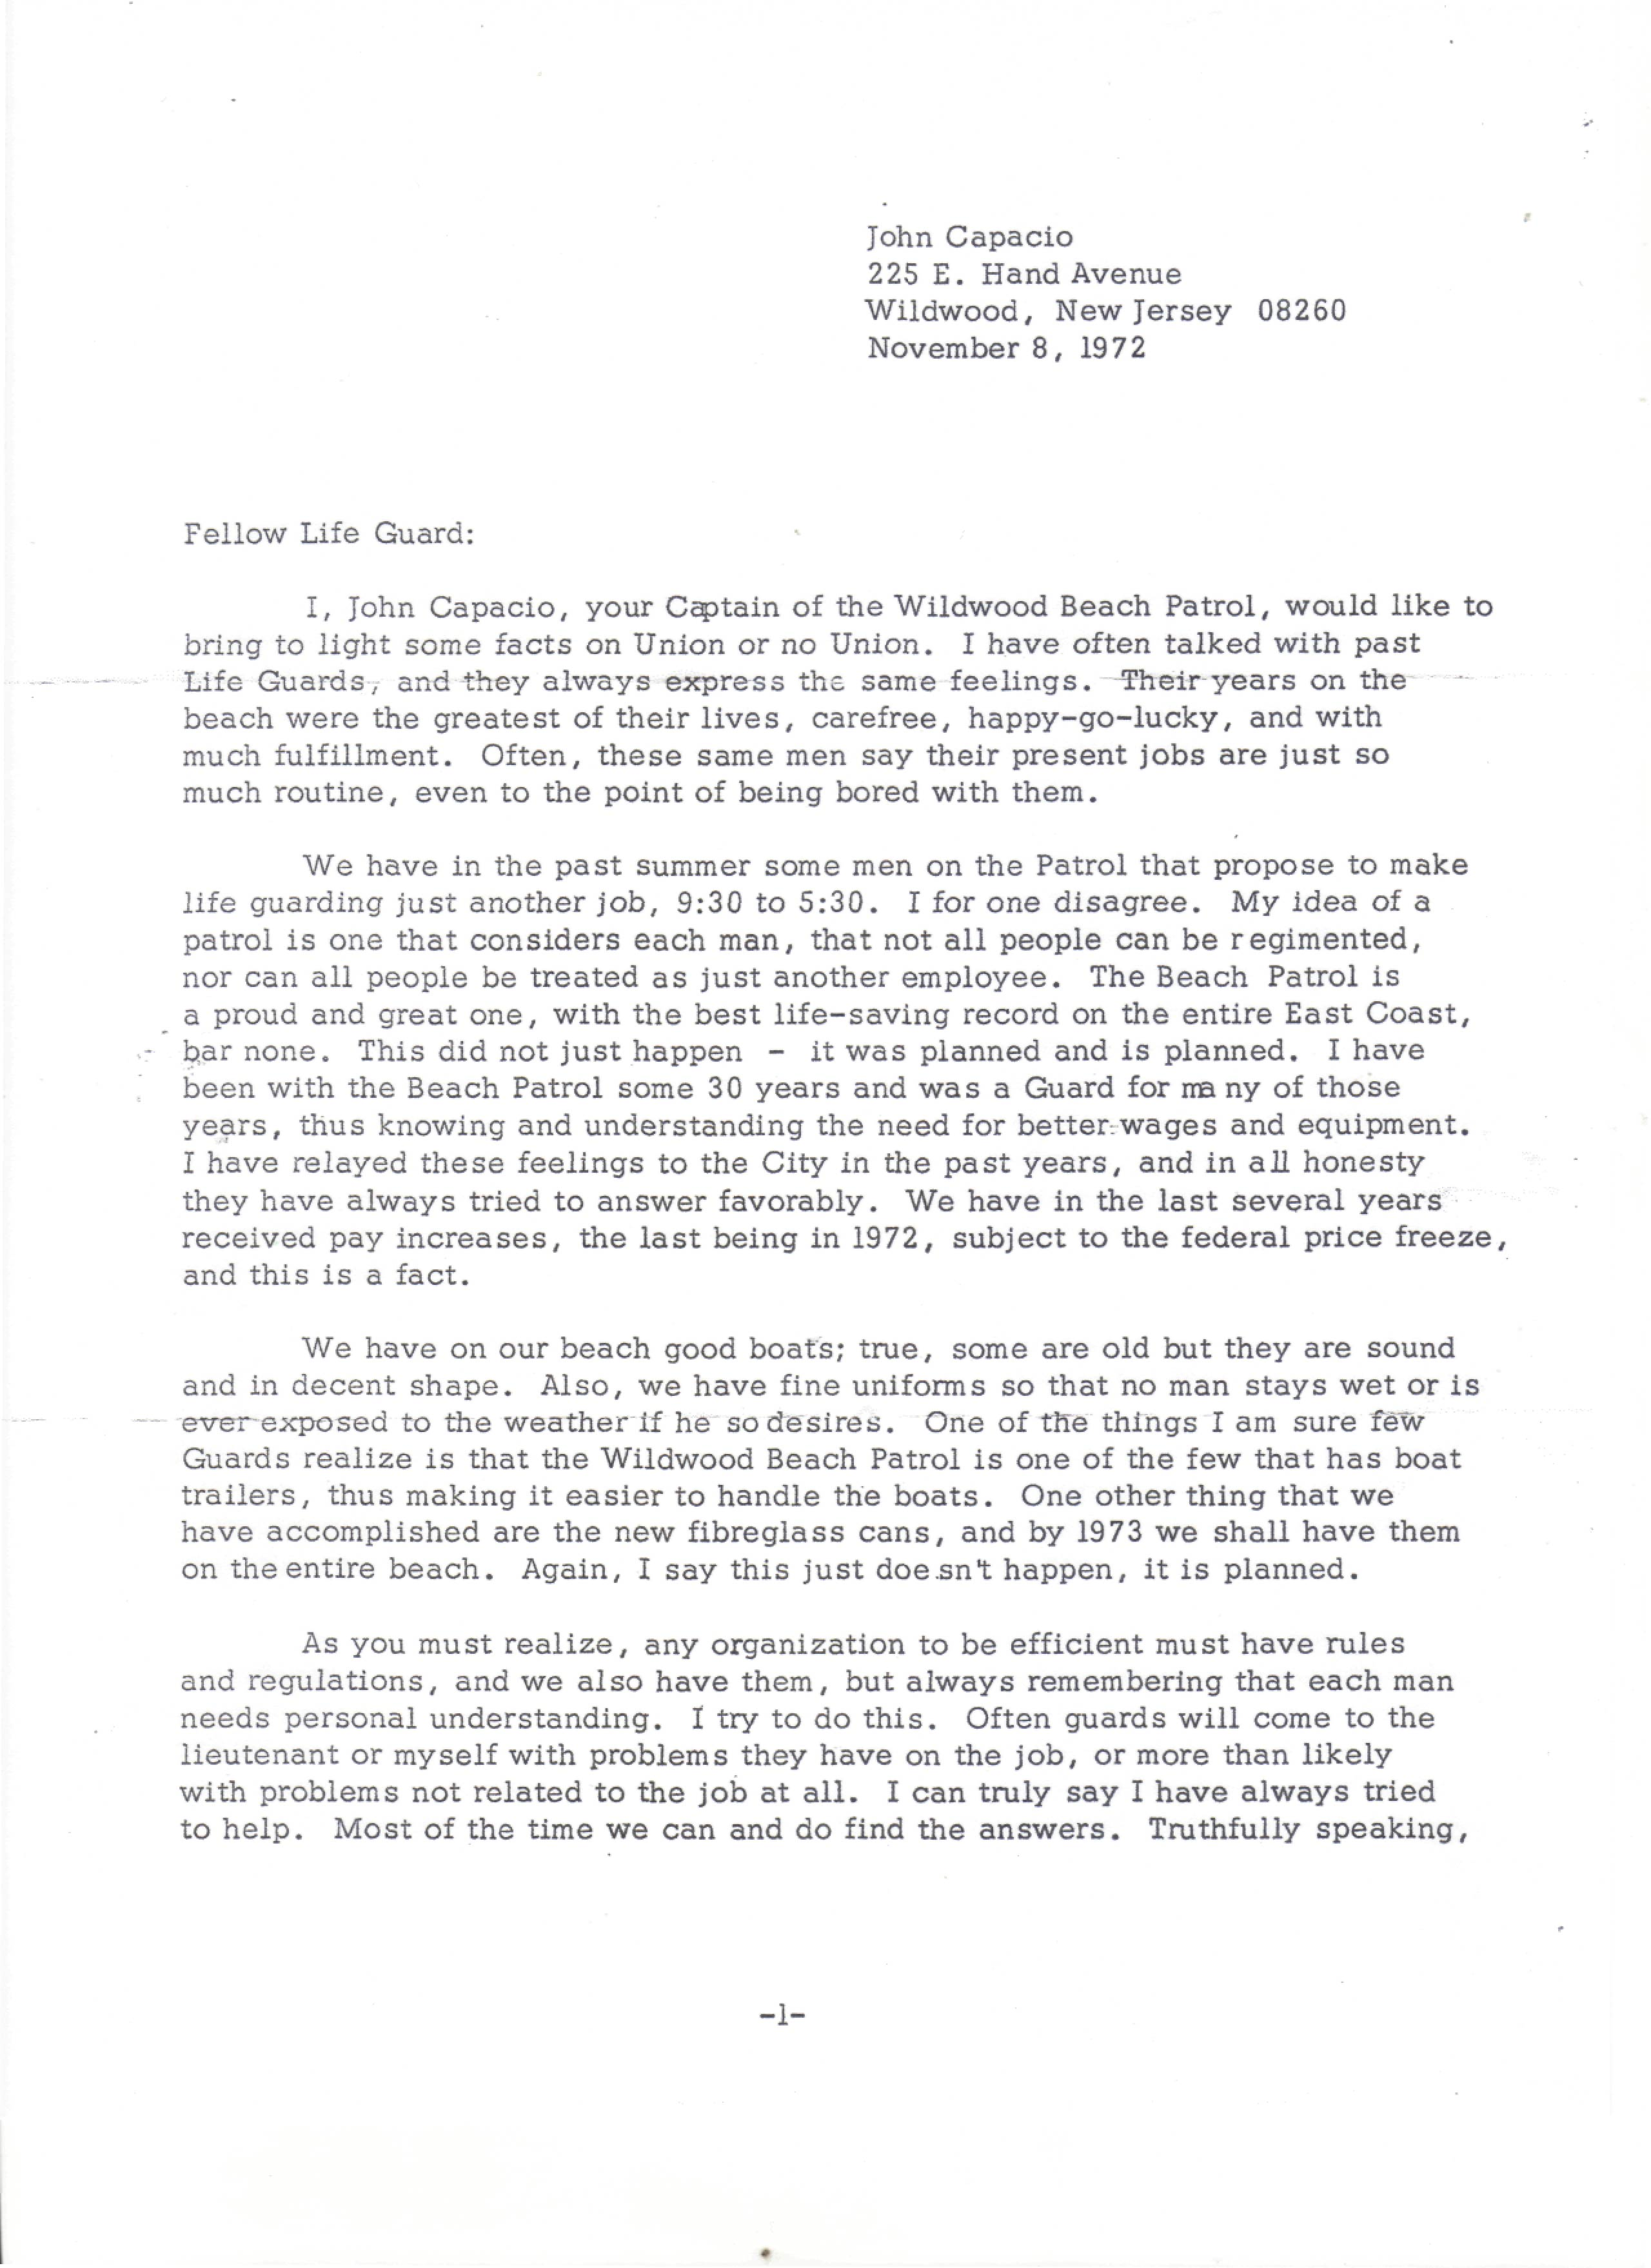 Letter from John Capacio (November 8, 1972)